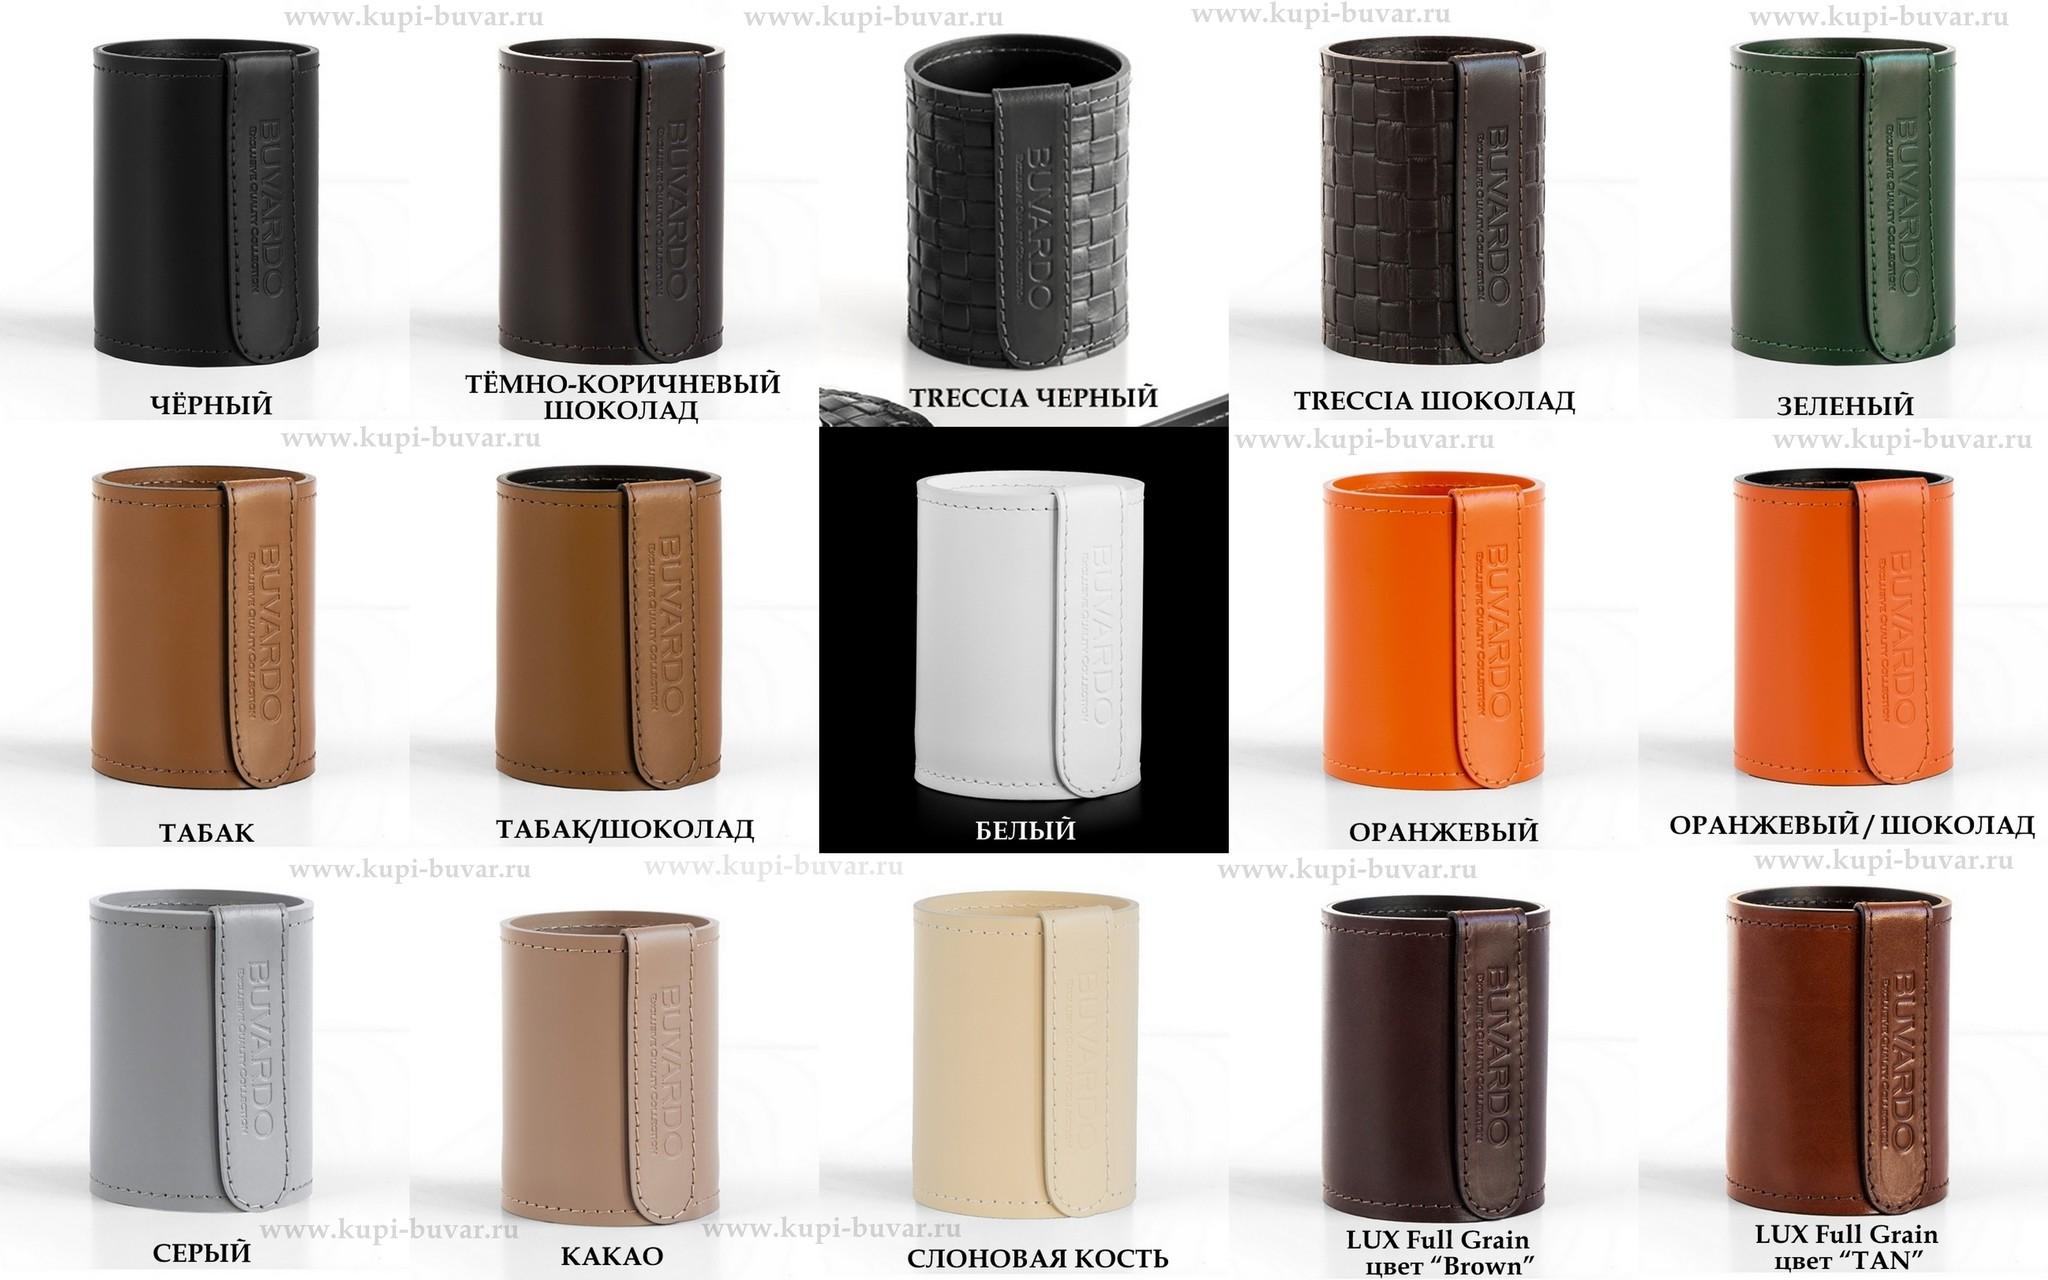 Варианты цвета кожи Cuoietto для набора 9002 3 предмета.